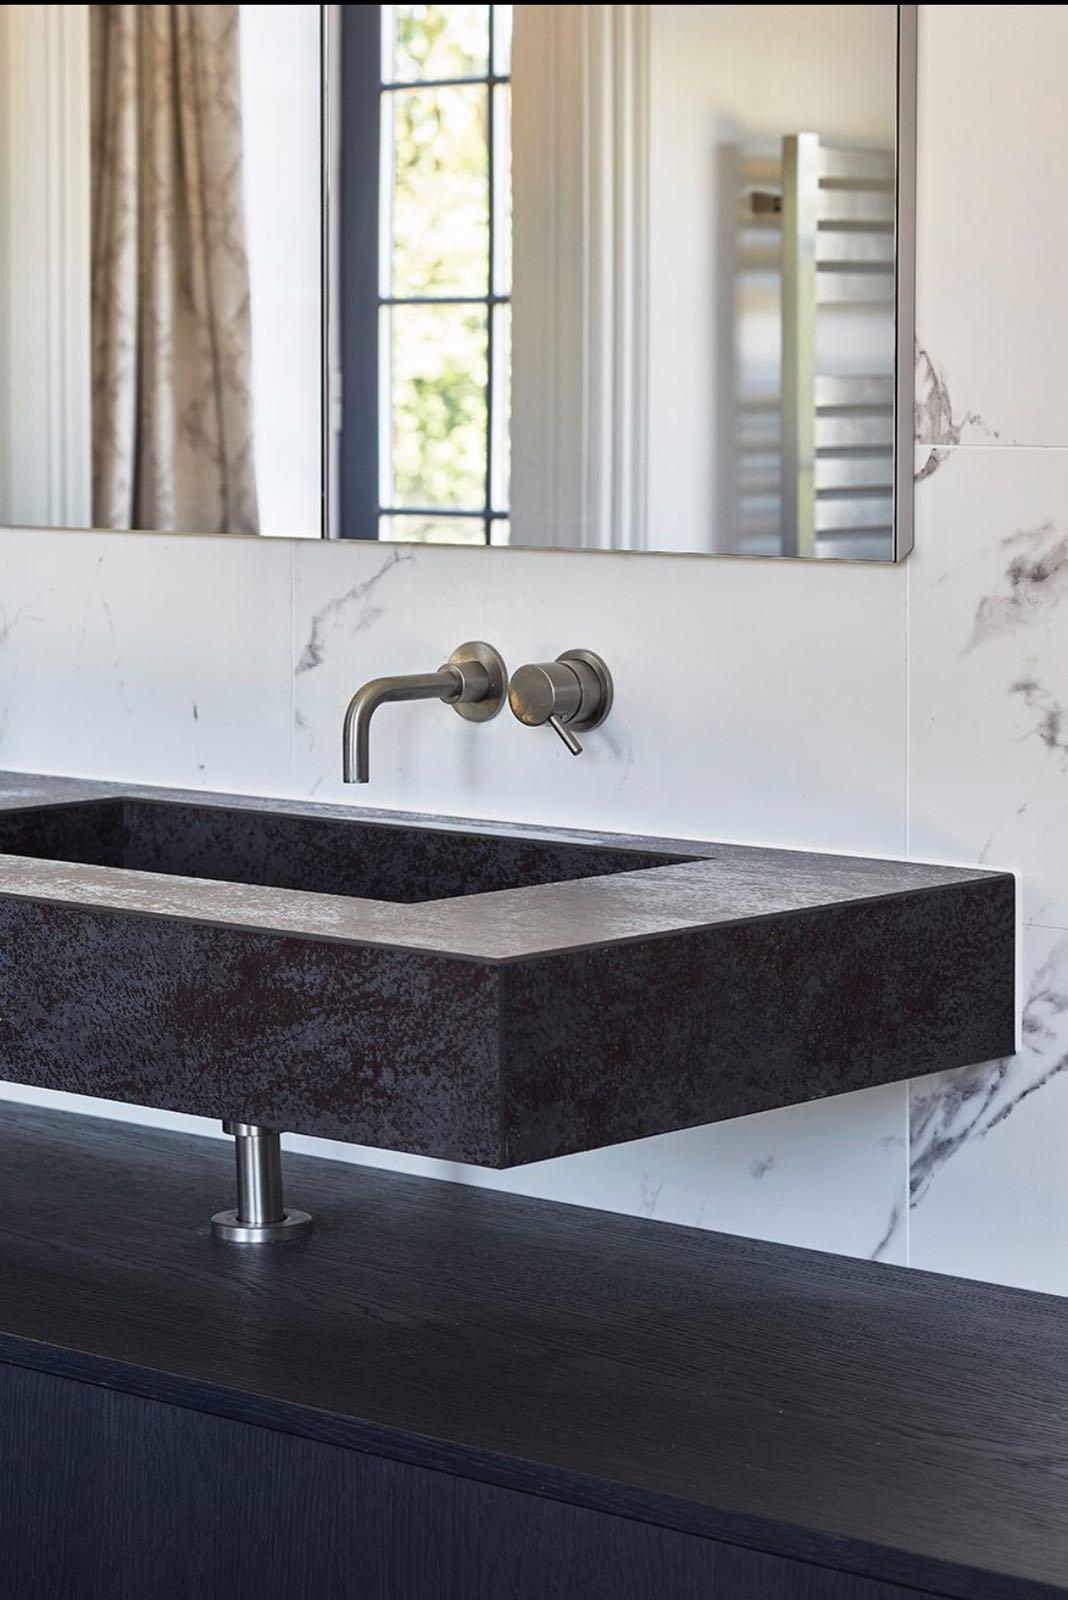 whitegates_project_bathroom_sink.JPG